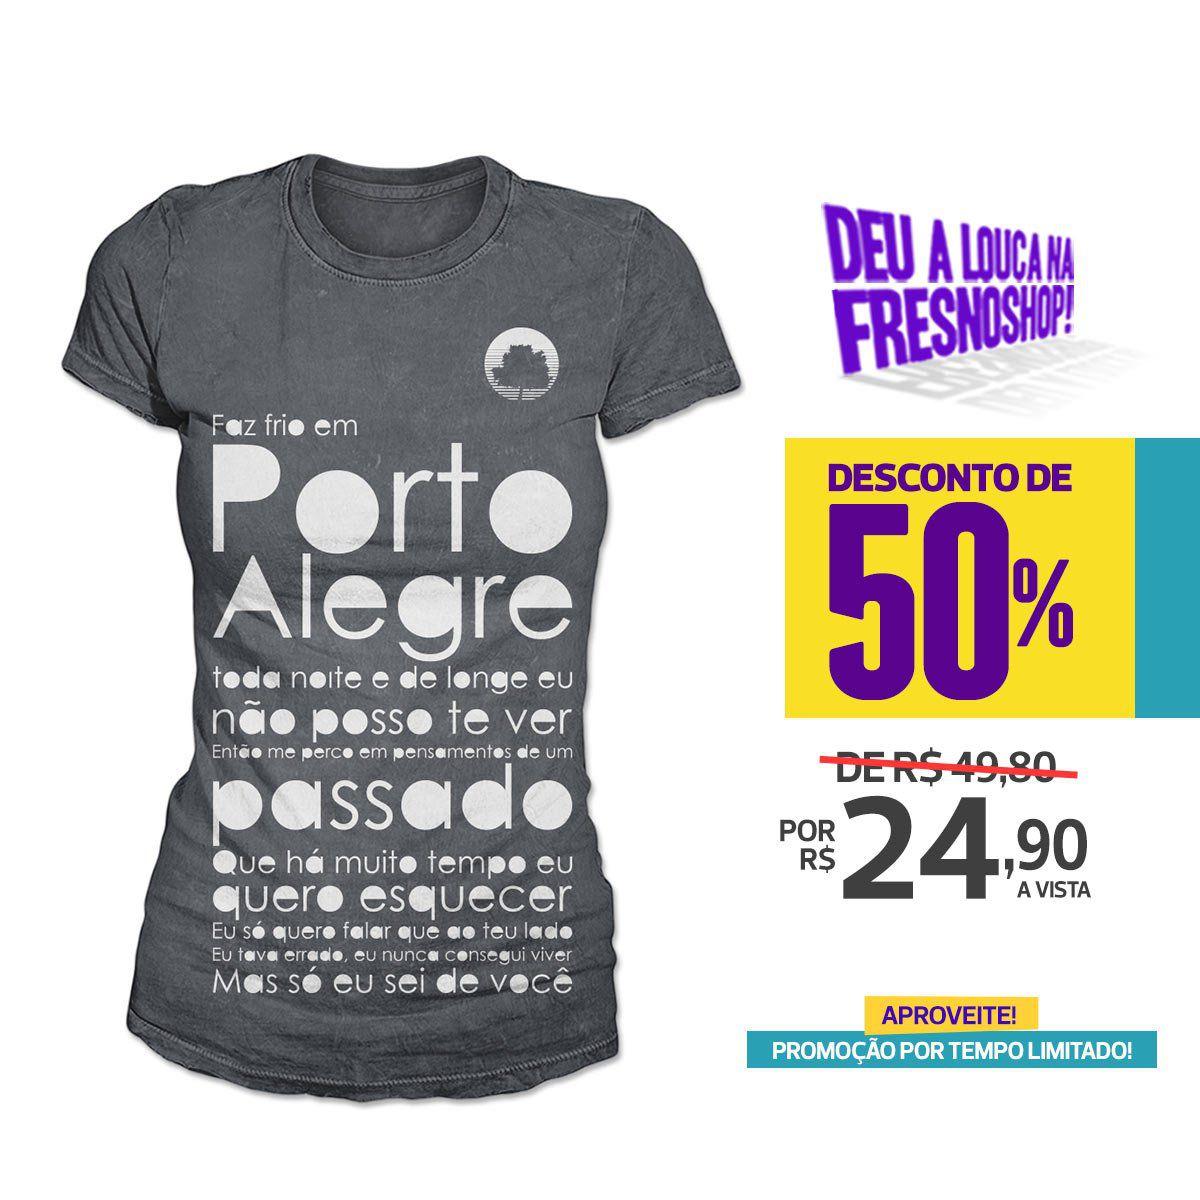 SUPER PROMOÇÃO Fresno - Camiseta Feminina Porto Alegre CHUMBO